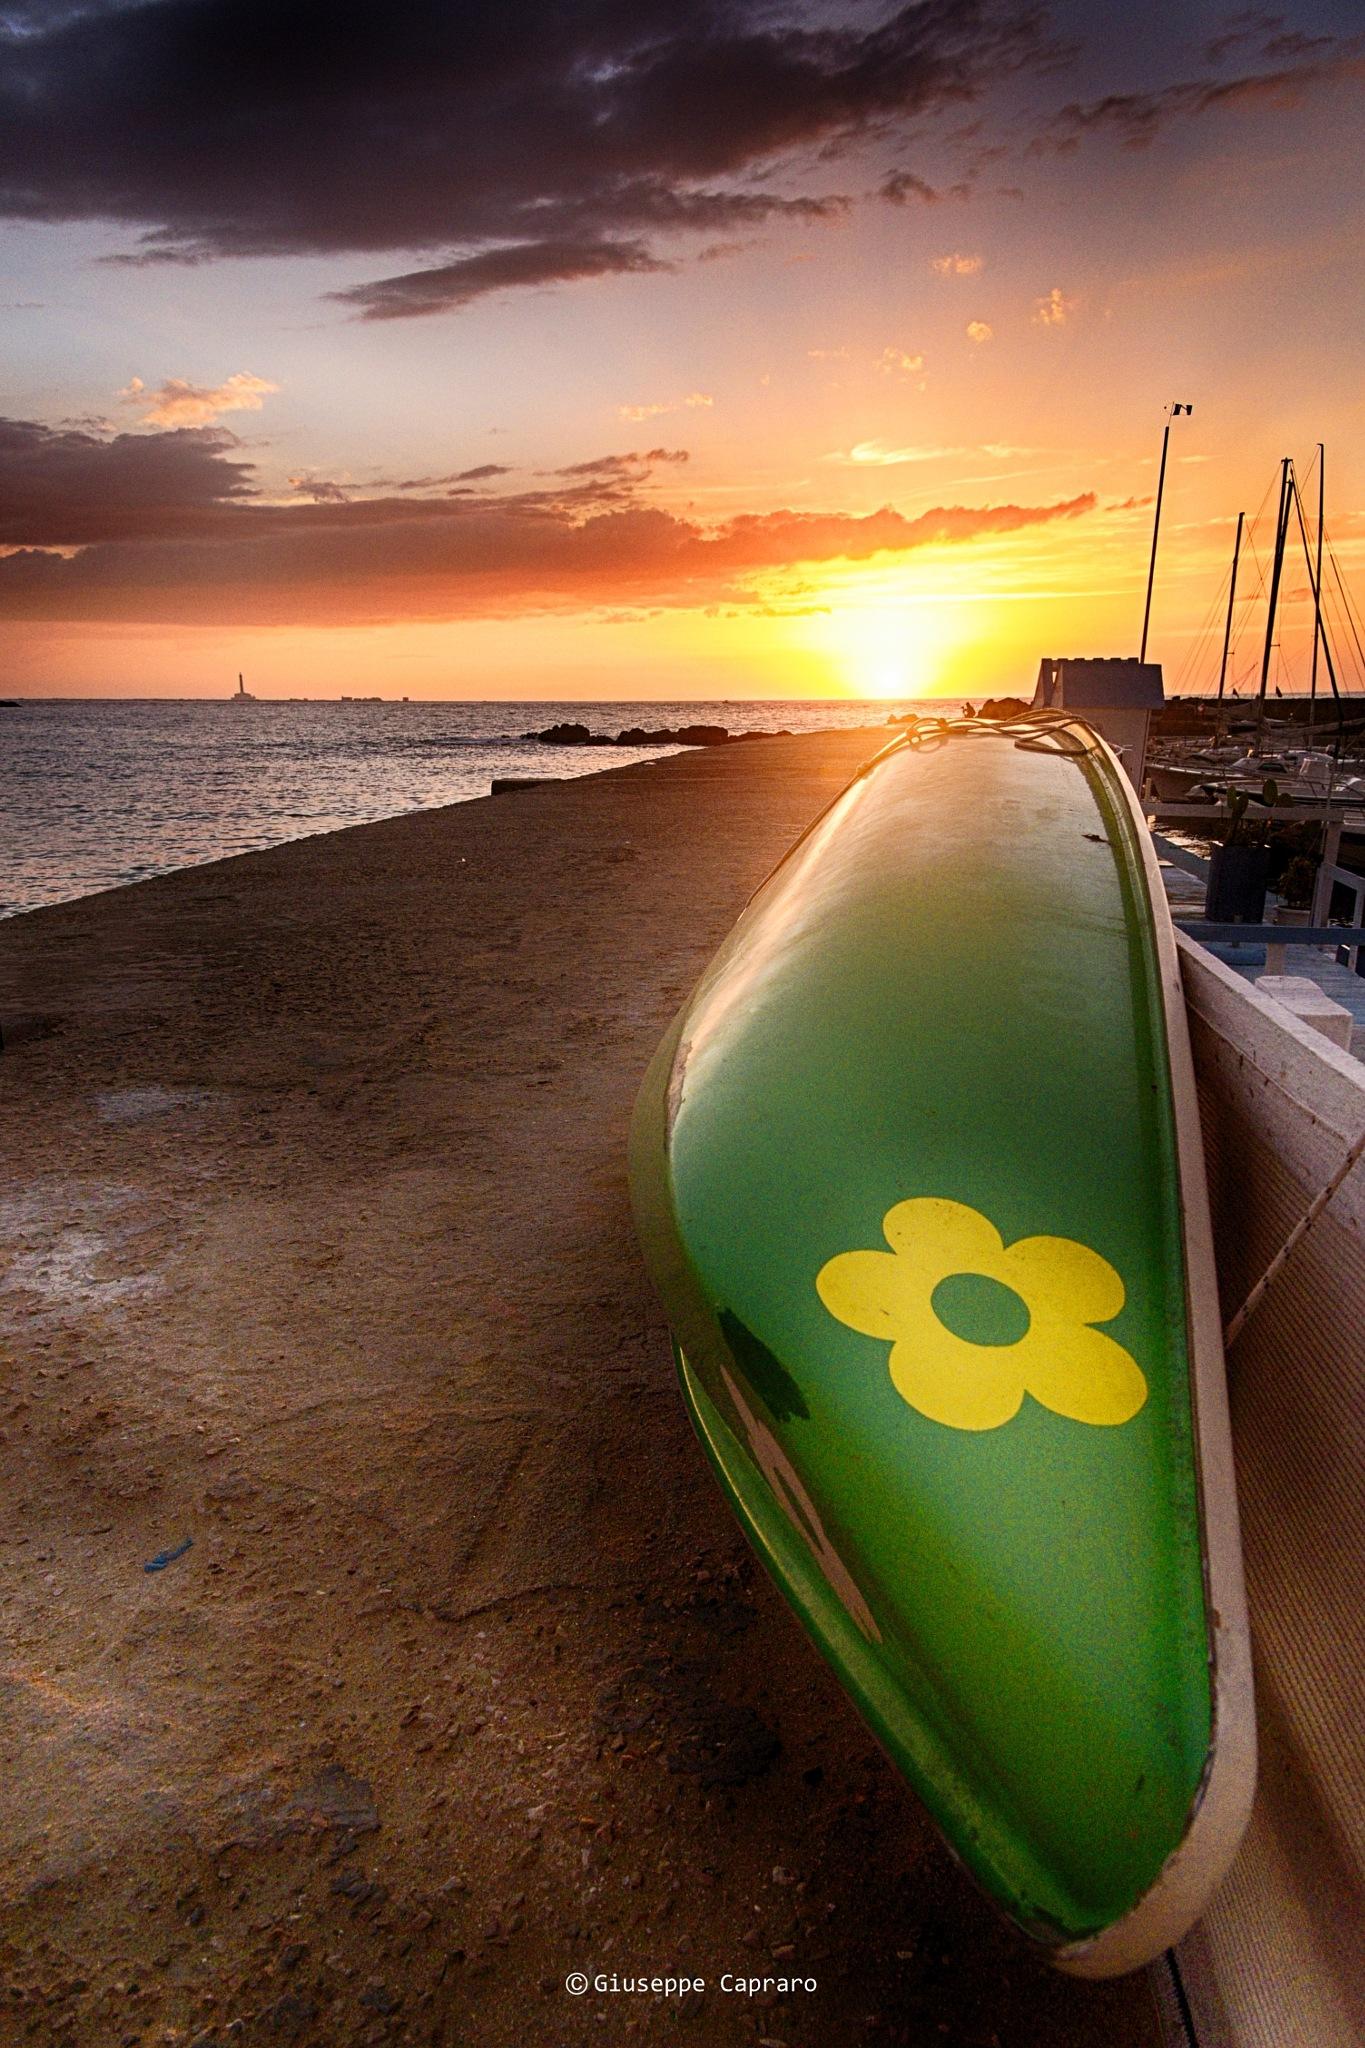 Daisy at sunset by Giuseppe Capraro